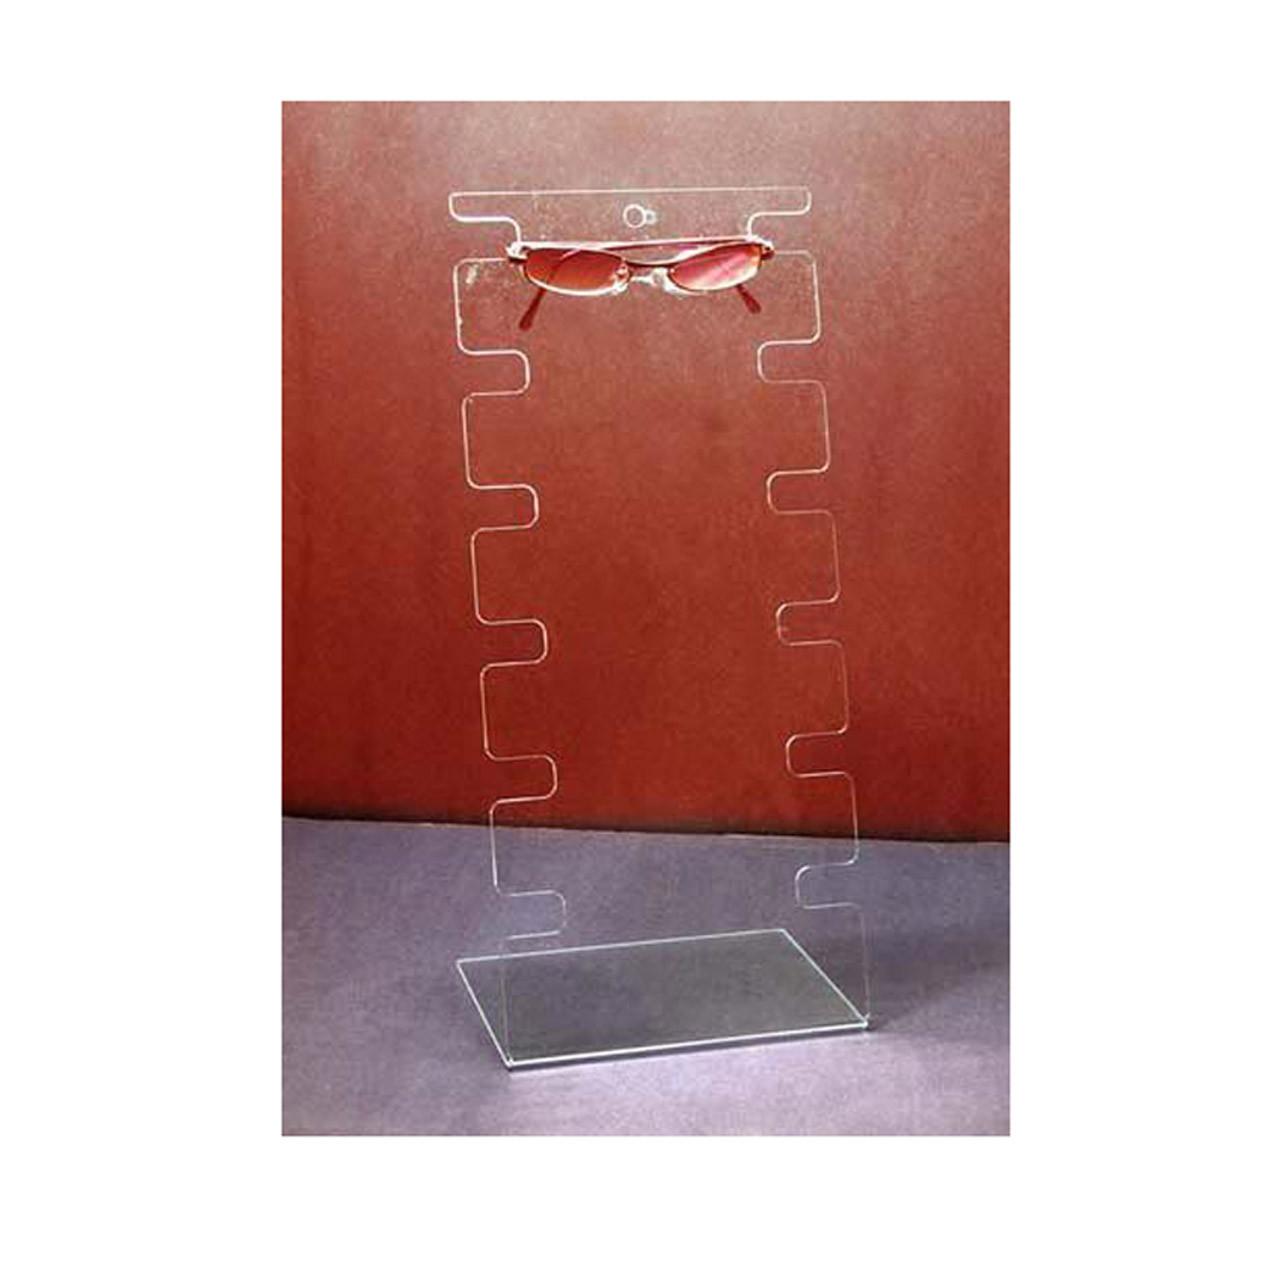 Sunglass Display | Clear Acrylic Sunglass Rack